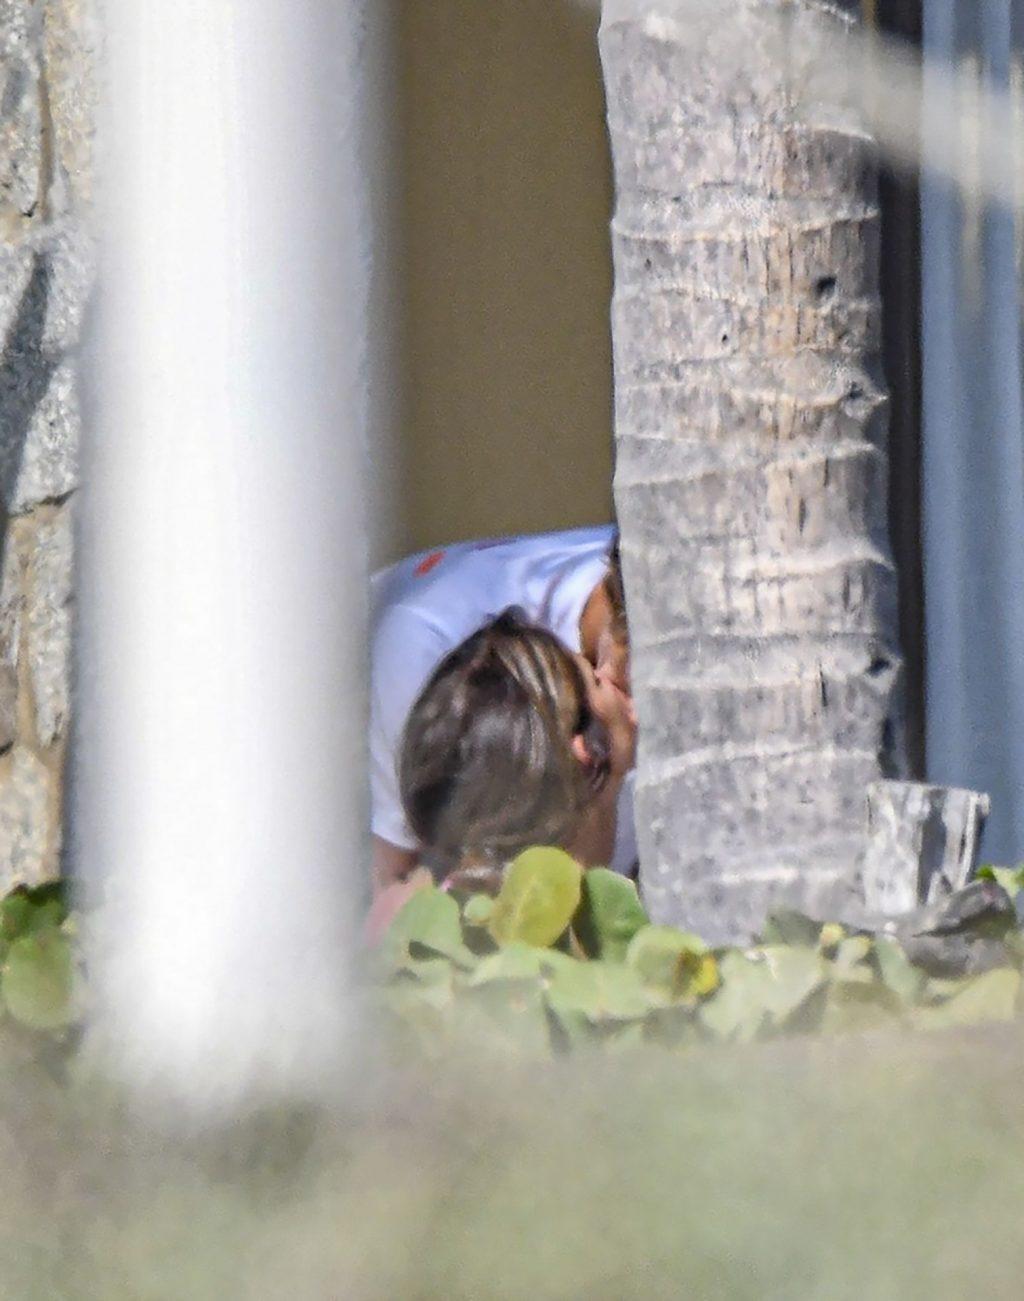 Alexander Zverev Enjoys a Romantic Getaway with His Girlfriend Brenda Patea in Acapulco (18 Photos)